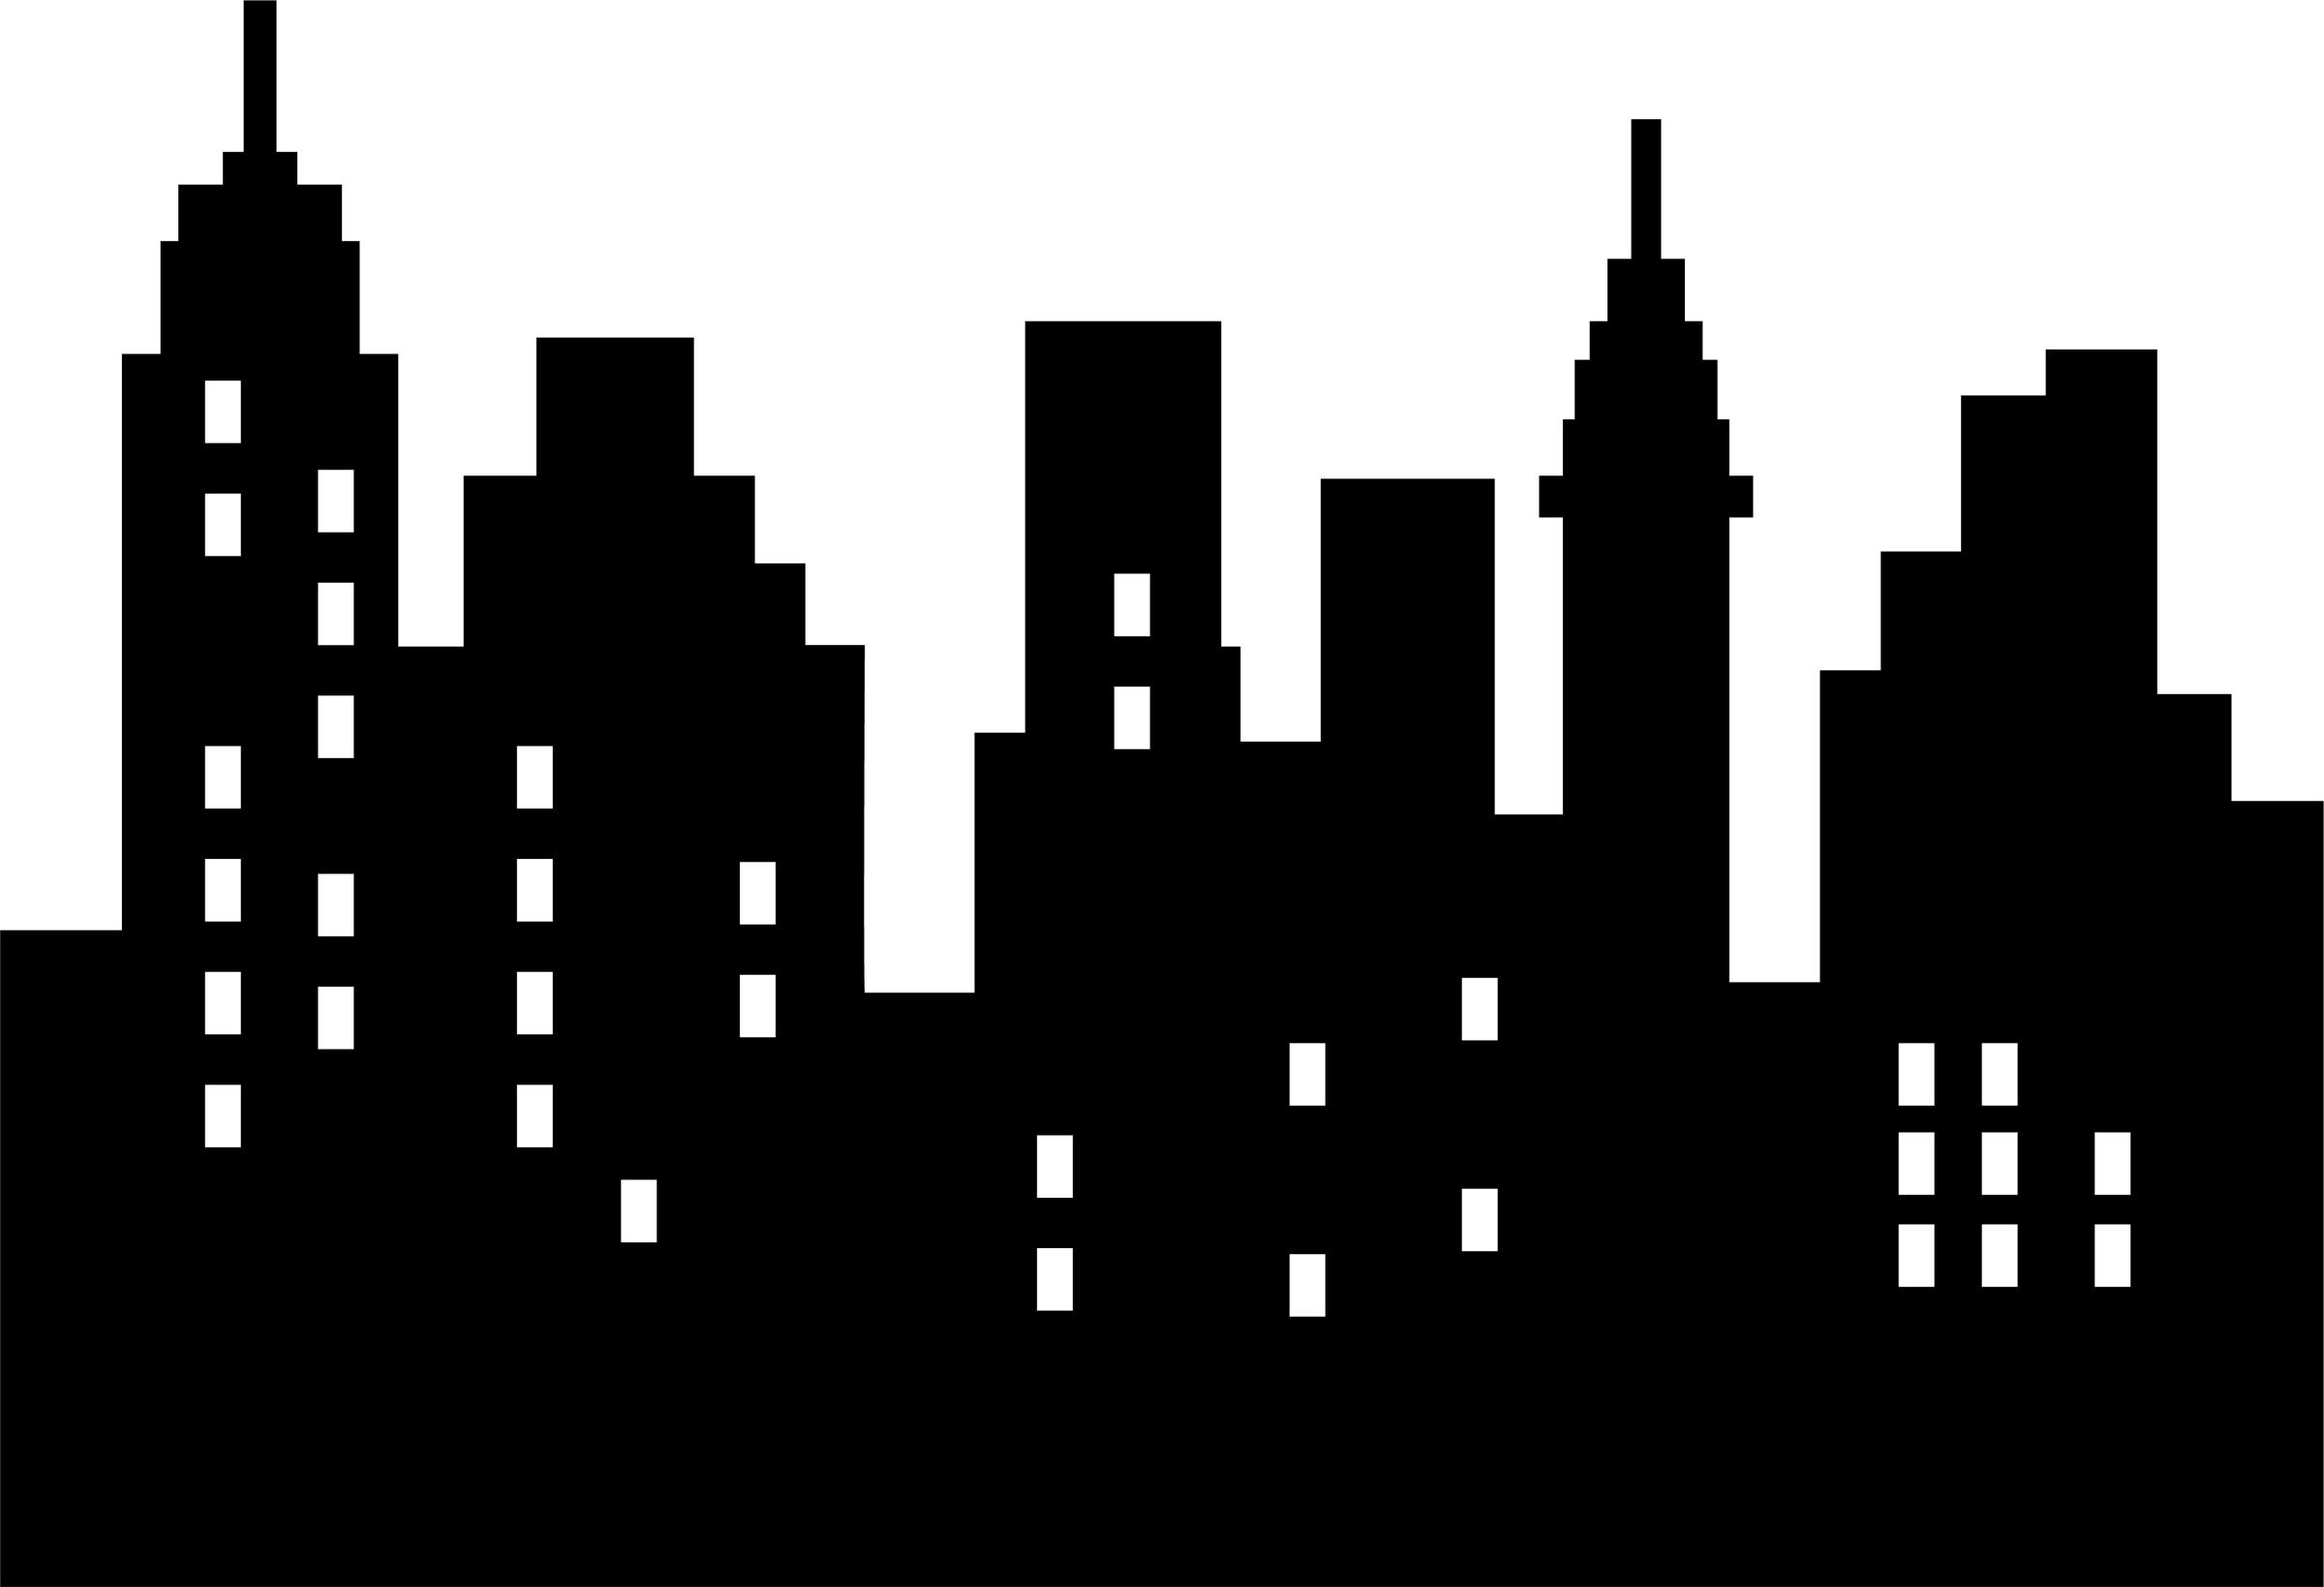 vector download Free cliparts download clip. City clipart